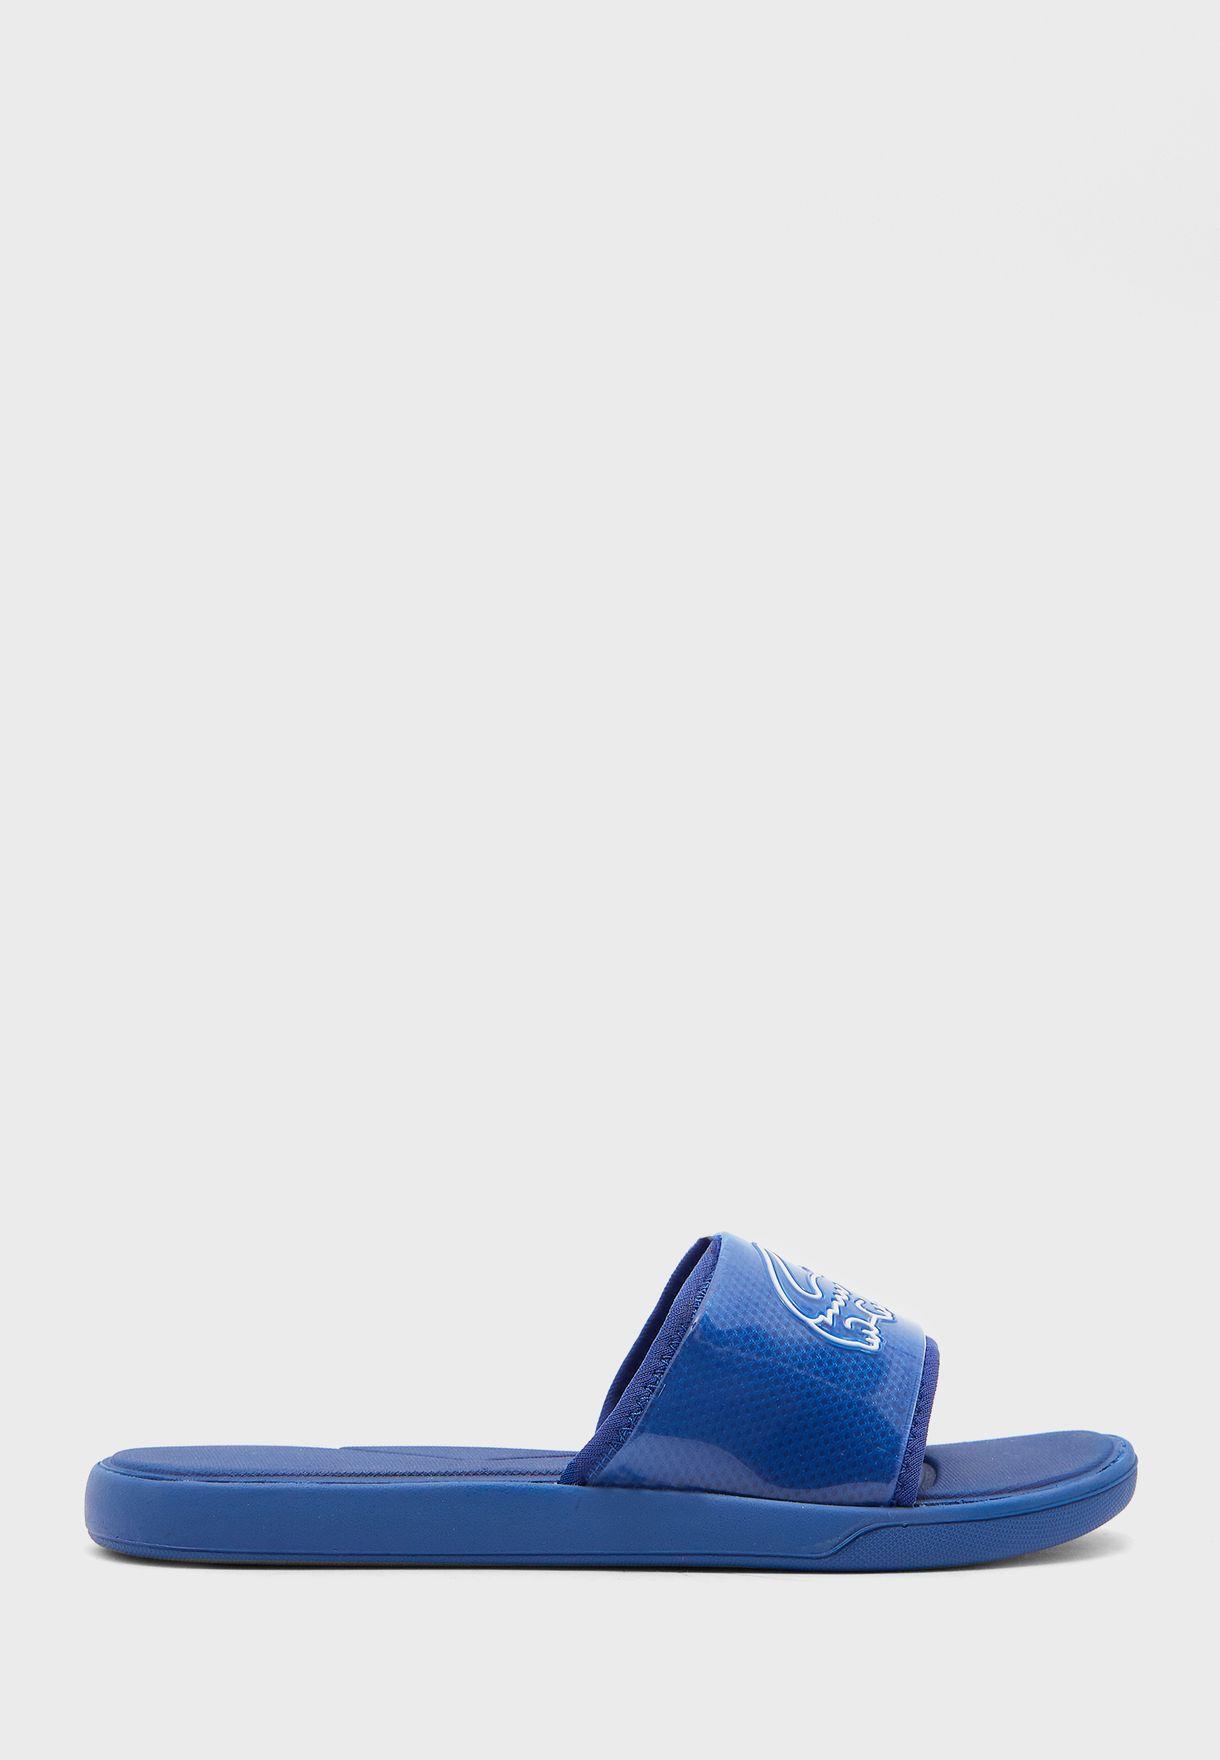 L.30 Neo Slide Flat Sandal